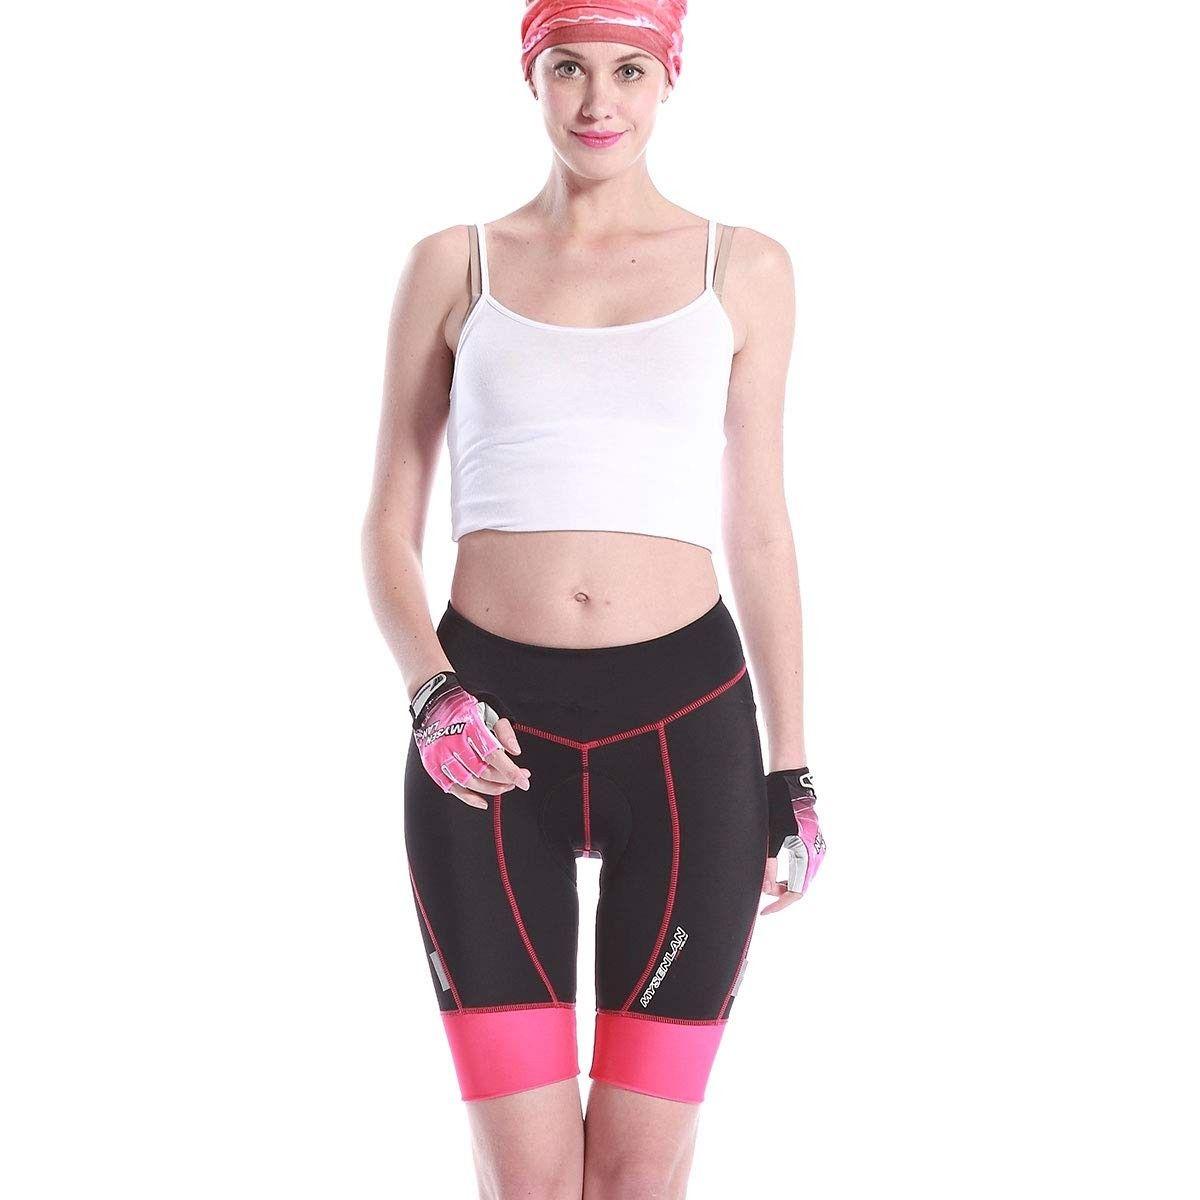 Women S Cycling Compression Shorts 3d Padded Bike Bicycle Pants Riding Tights Pink Cr18kyt6cmq Outdoor Clothing Bicycle Pants Riding Tights Cycling Women